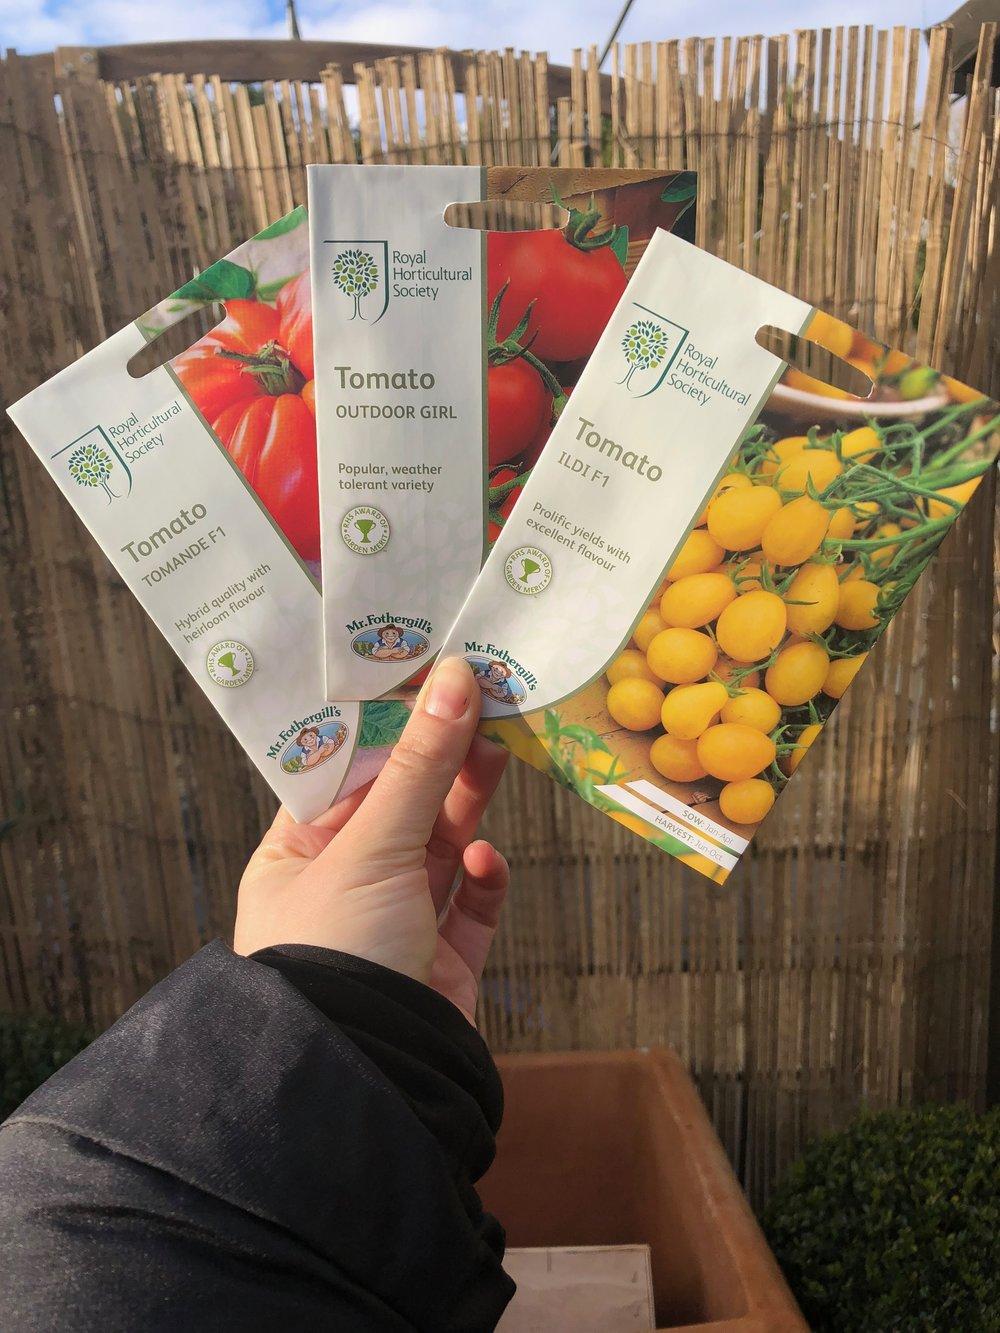 RHS Tomato seeds